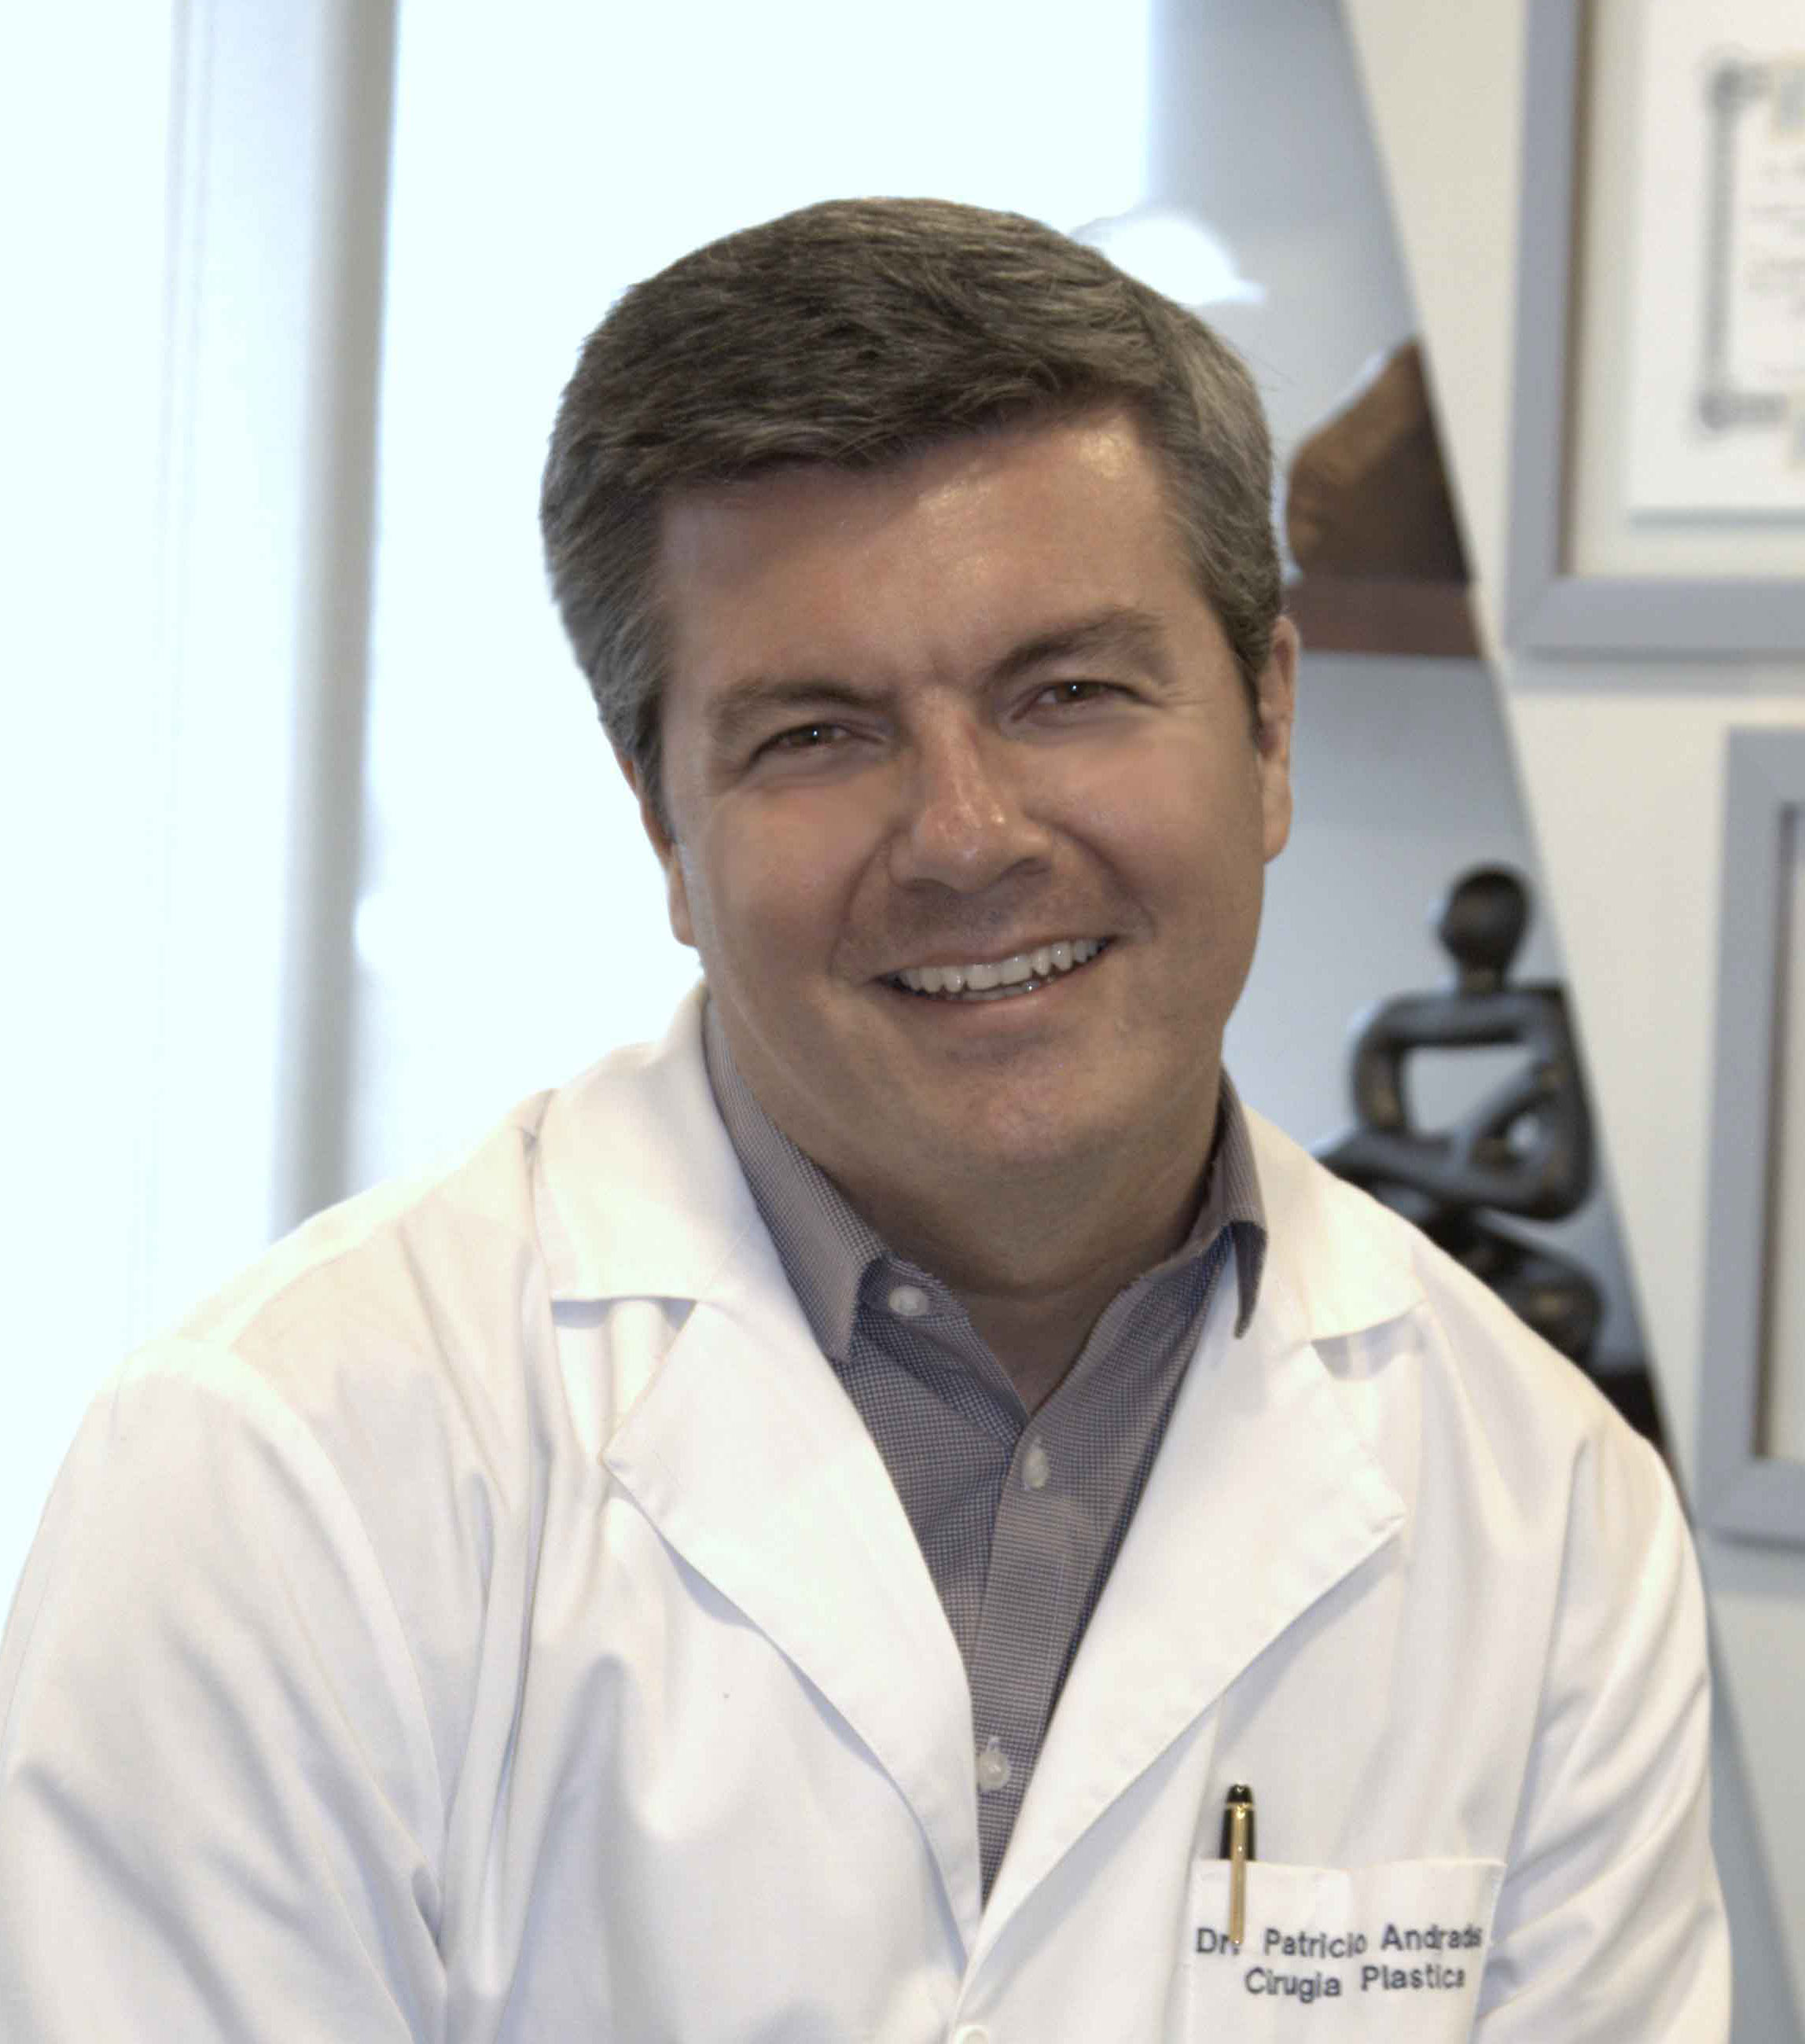 Patricio Andrades MD, FACS